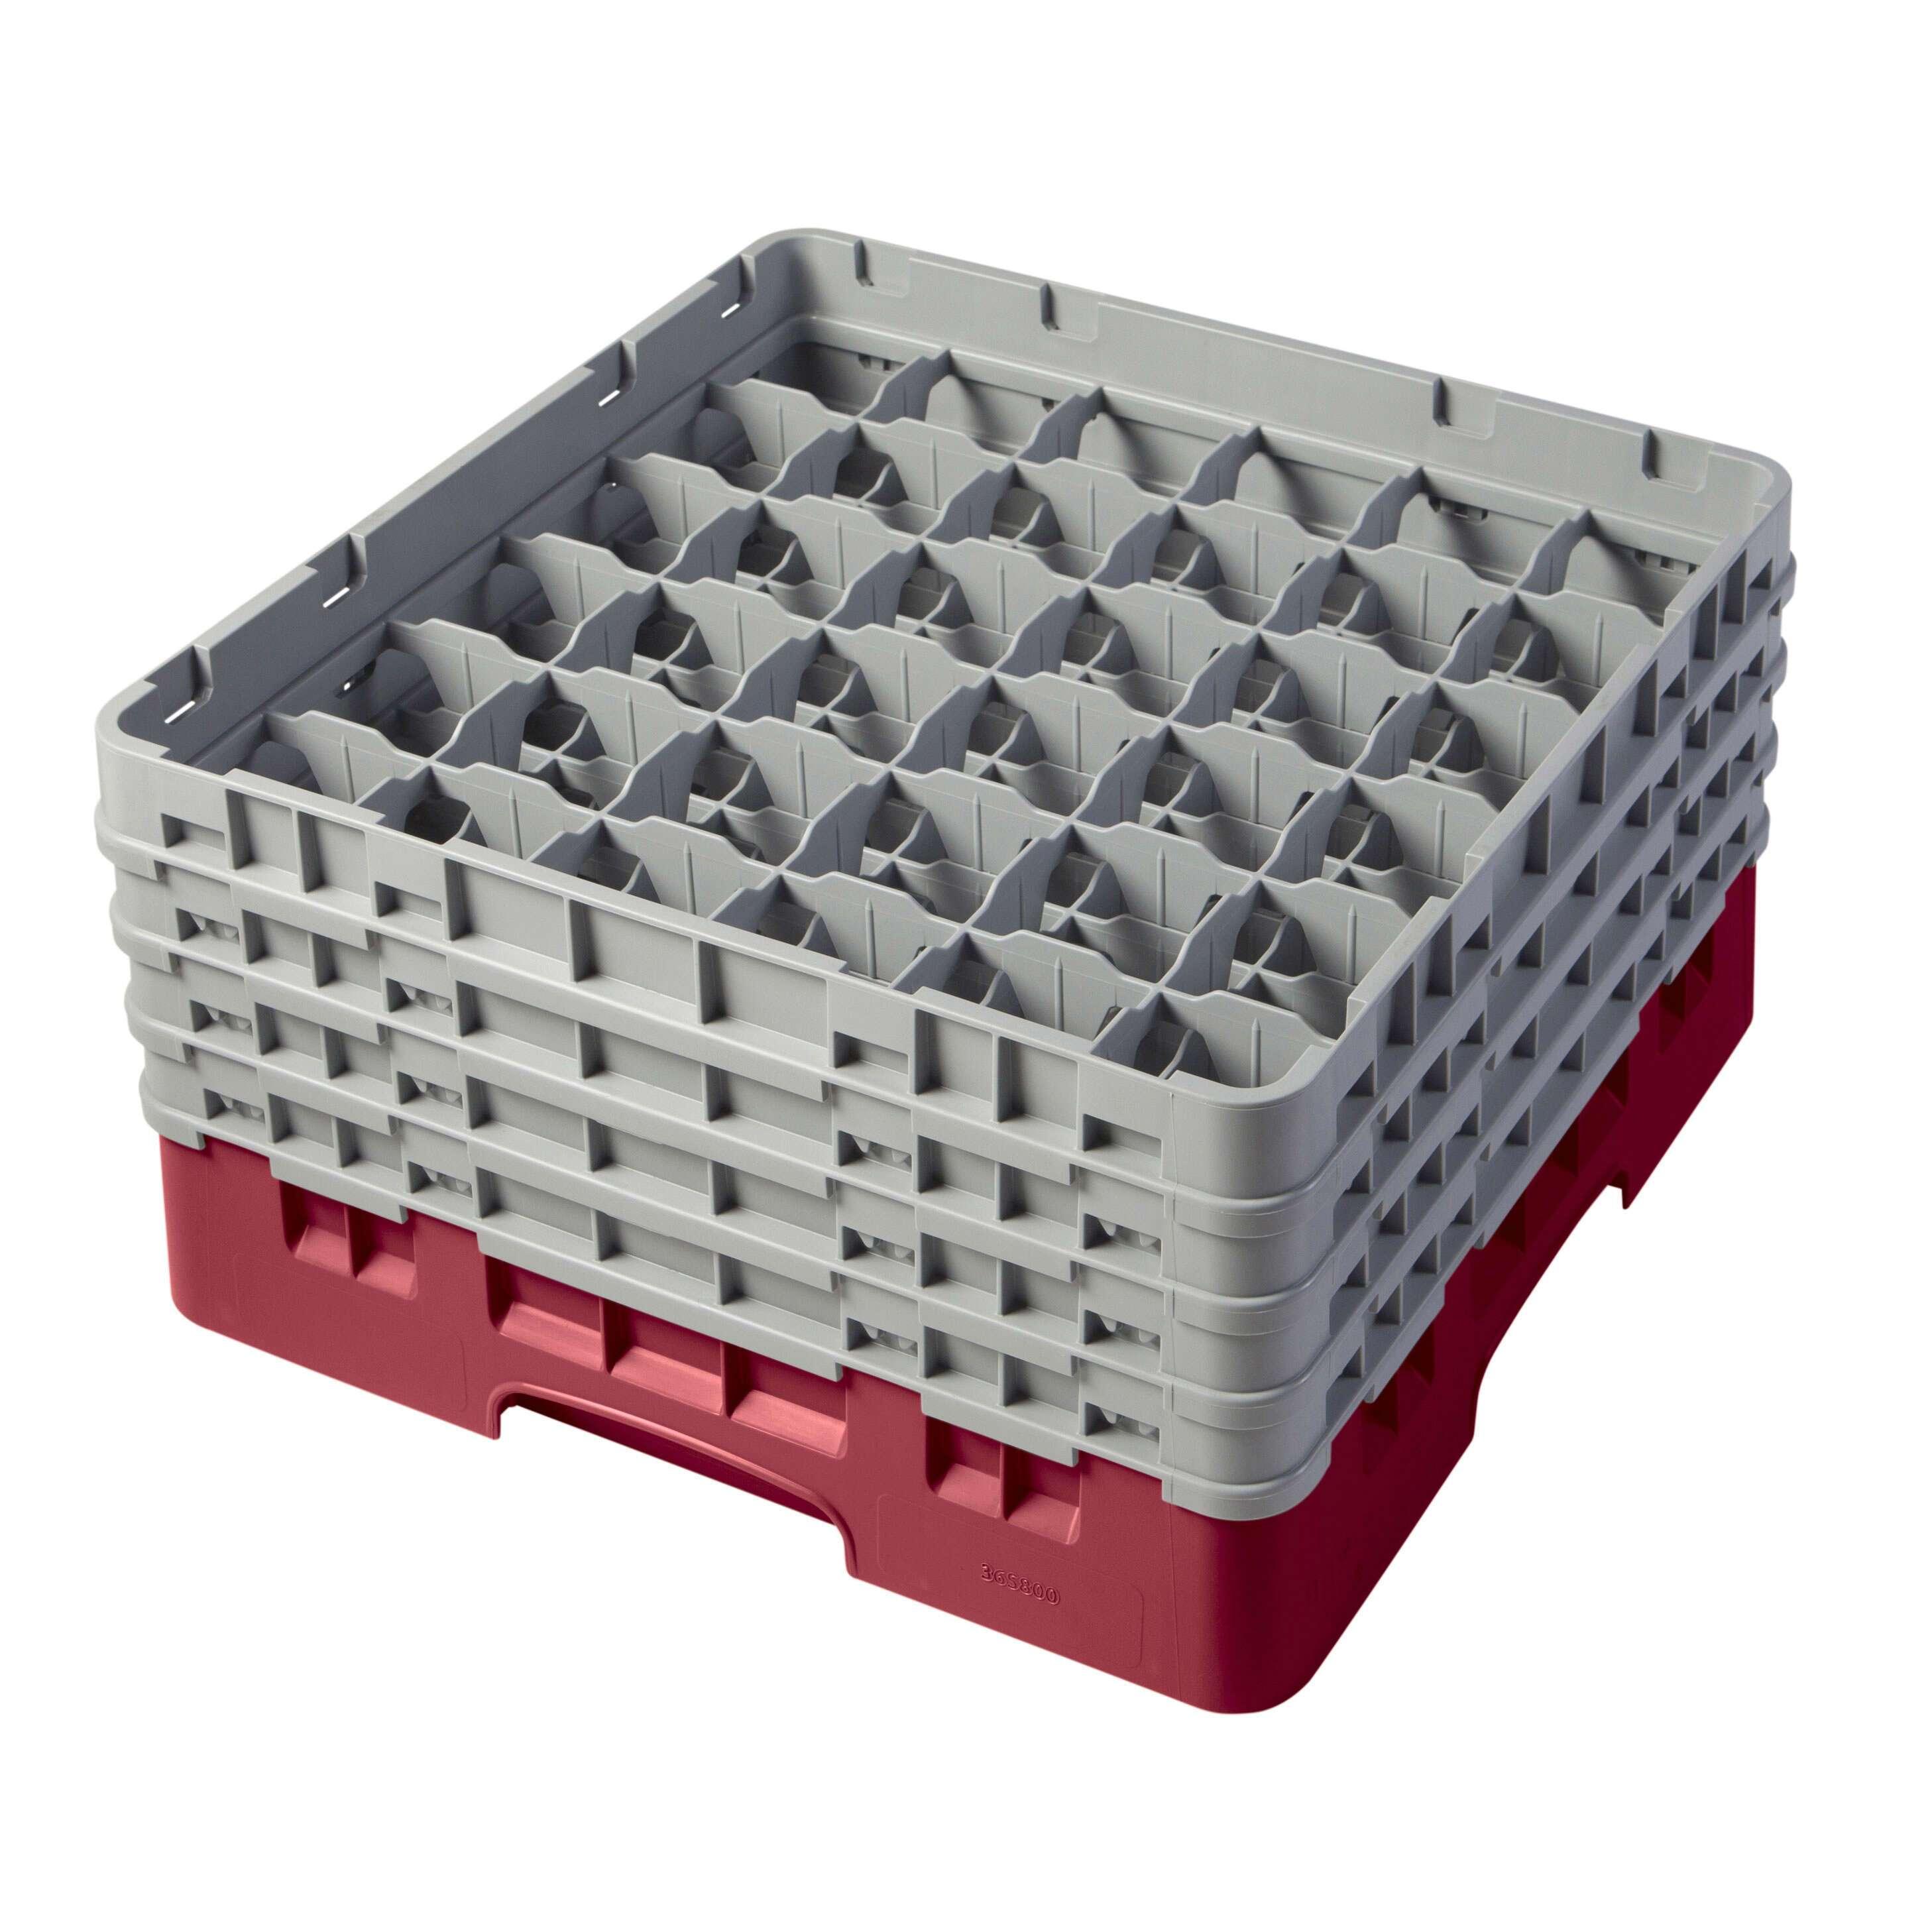 Vollrath Traex Black Plastic 49 Compartment Dishwashing Base Rack 19 3//4L x 19 3//4W x 4H